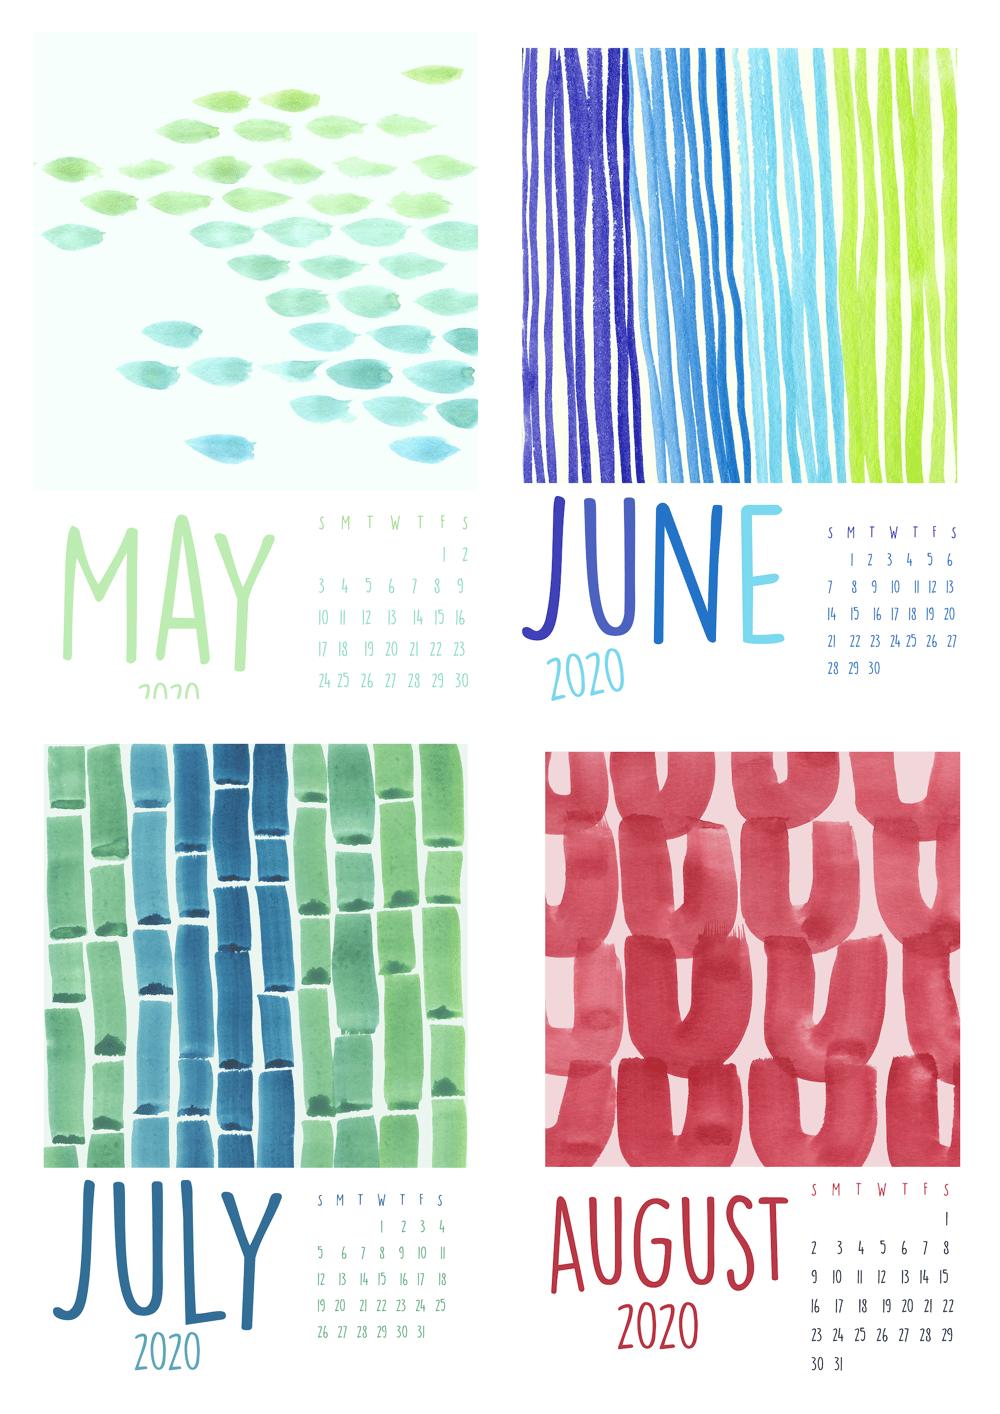 2020 Watercolor Calendar - image 1 - student project